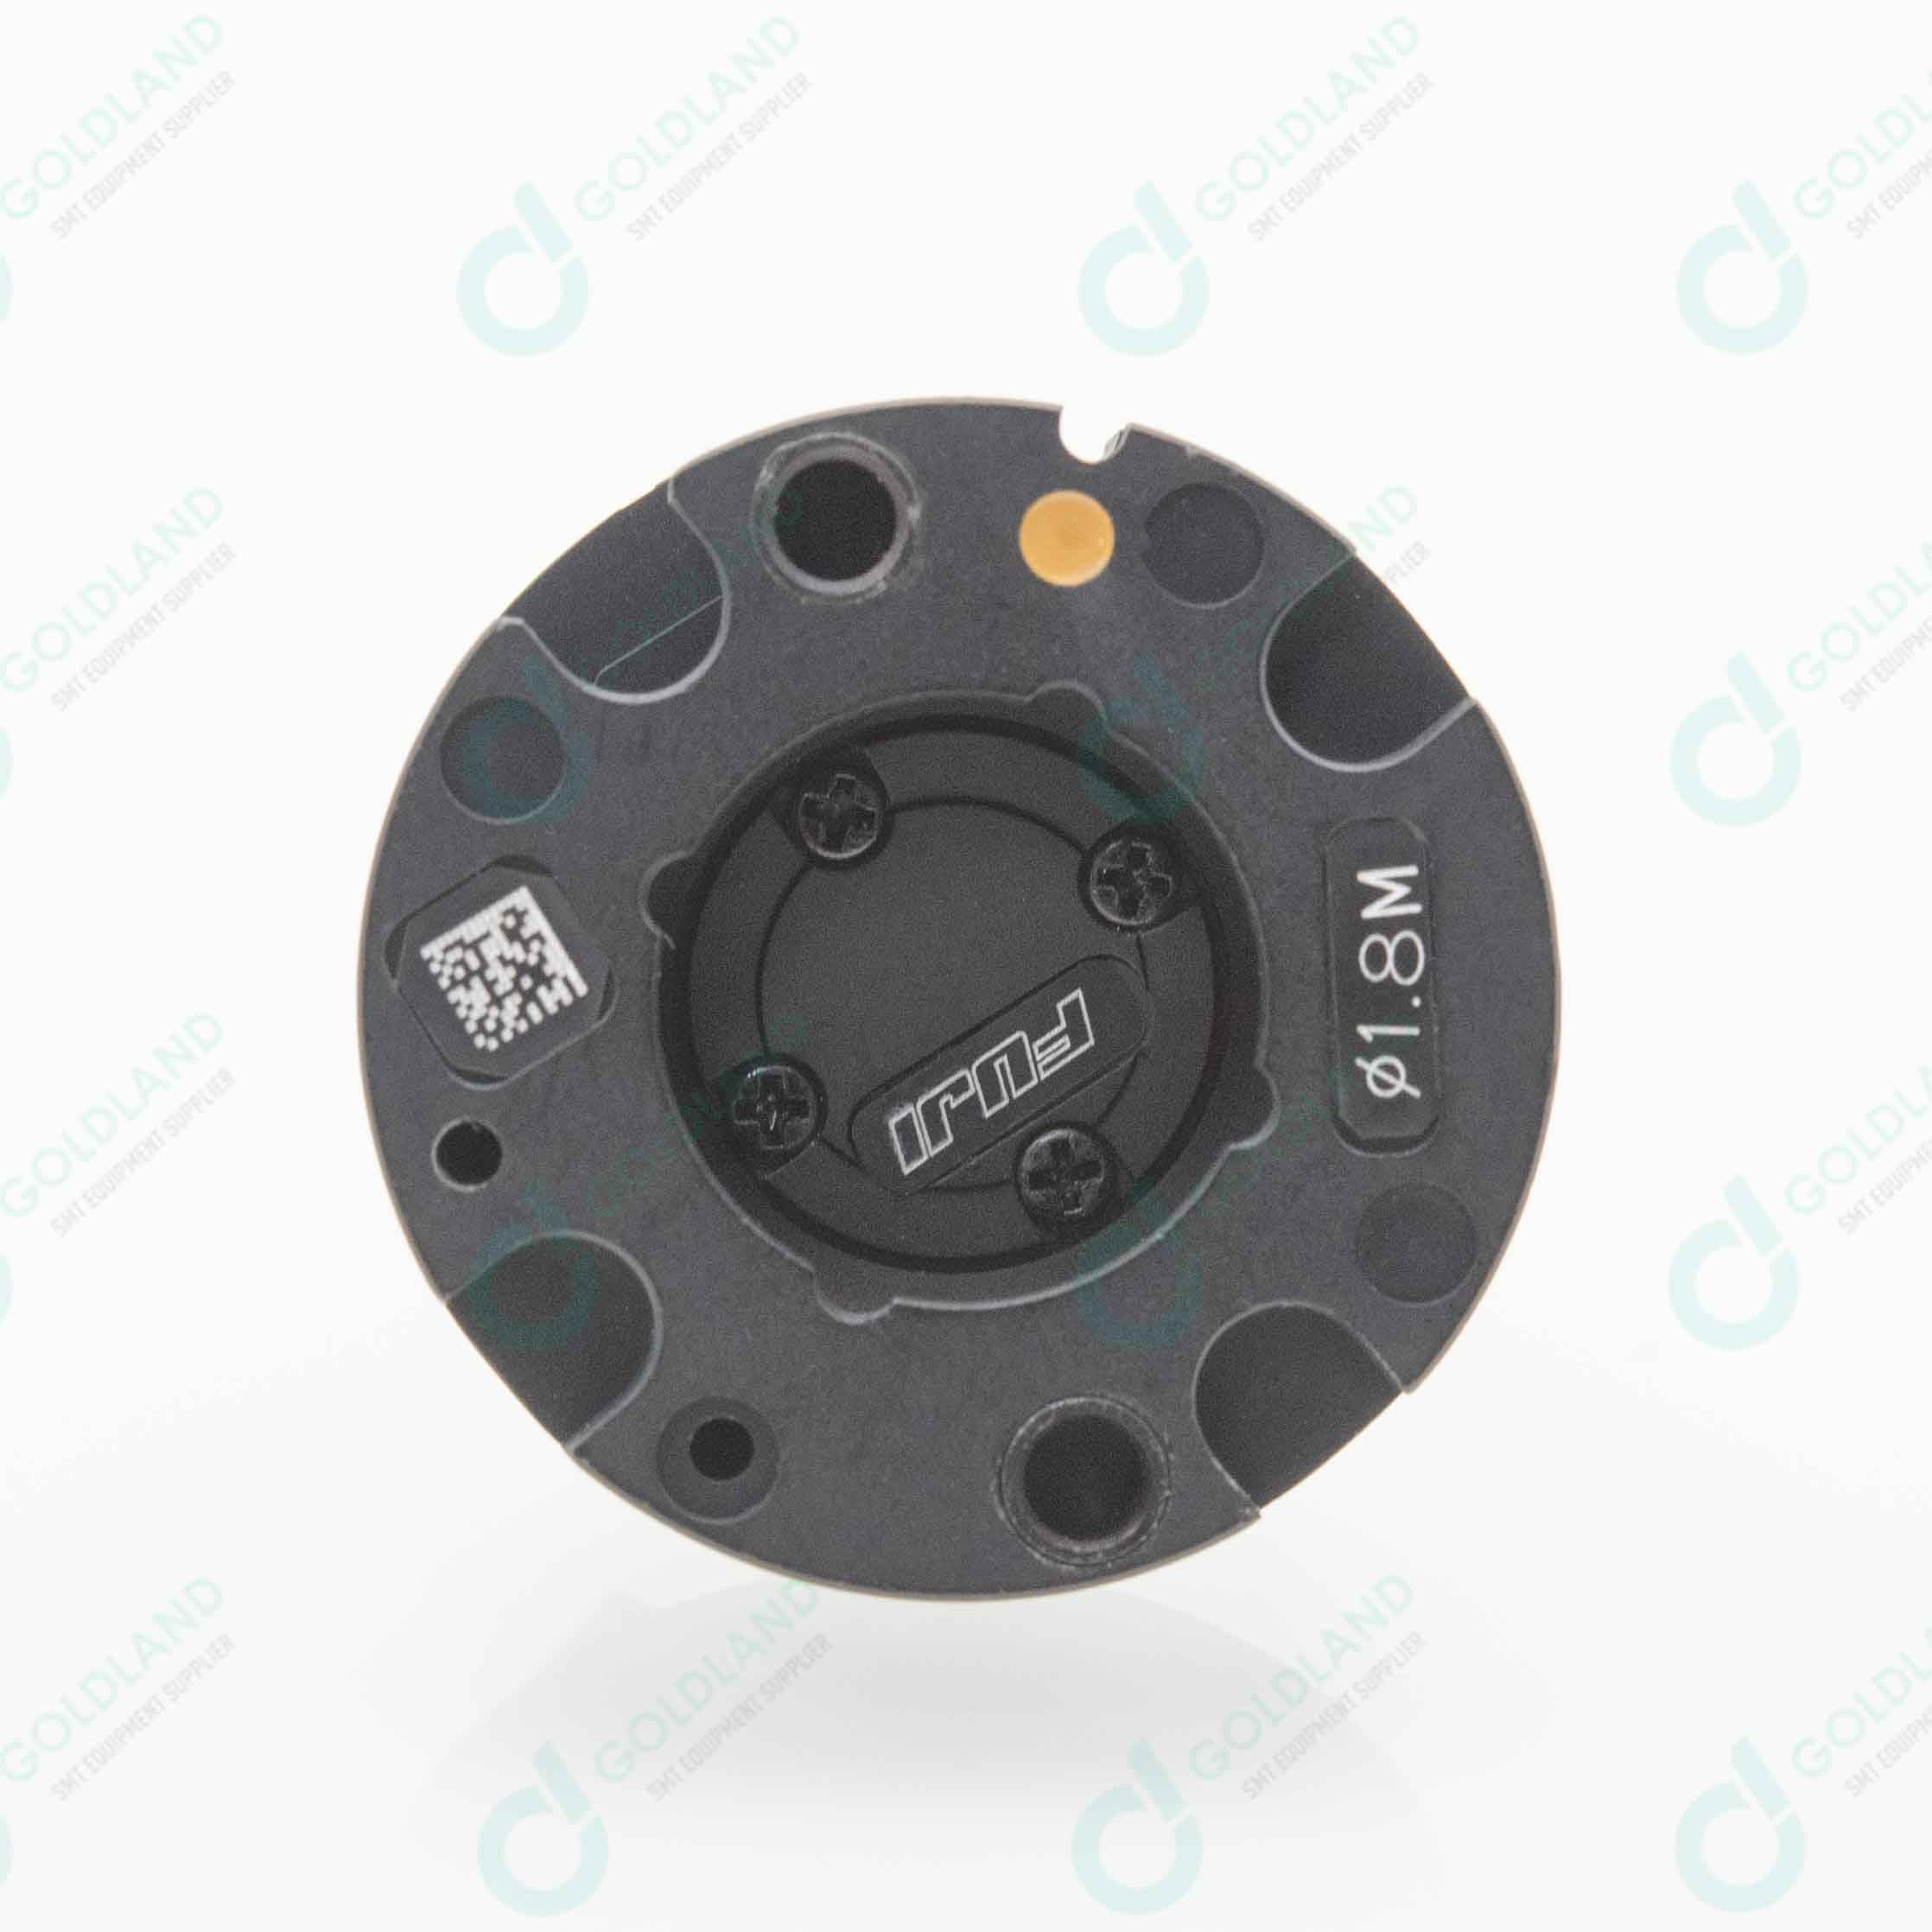 FUJI SMT chip place machine parts R28-018M-365-F FUJI Nozzle